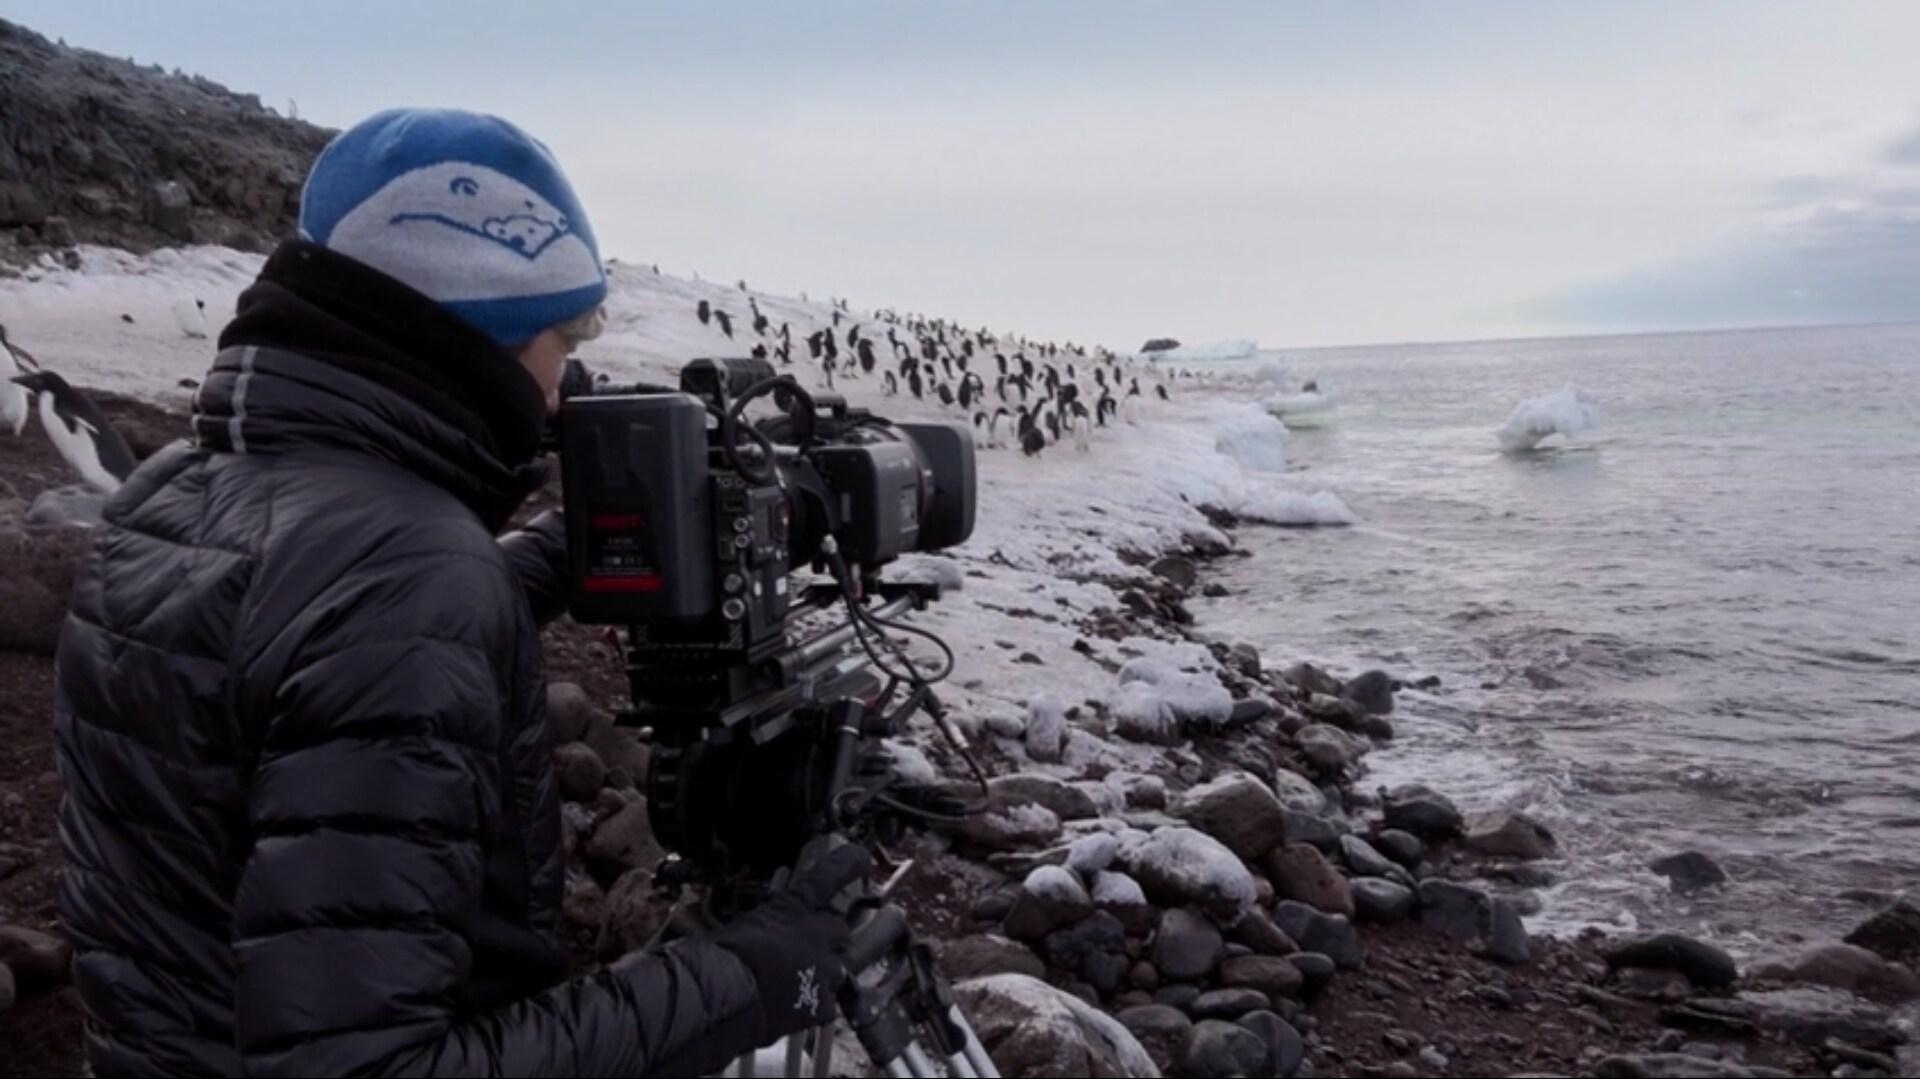 Cinegrafista filma pinguins